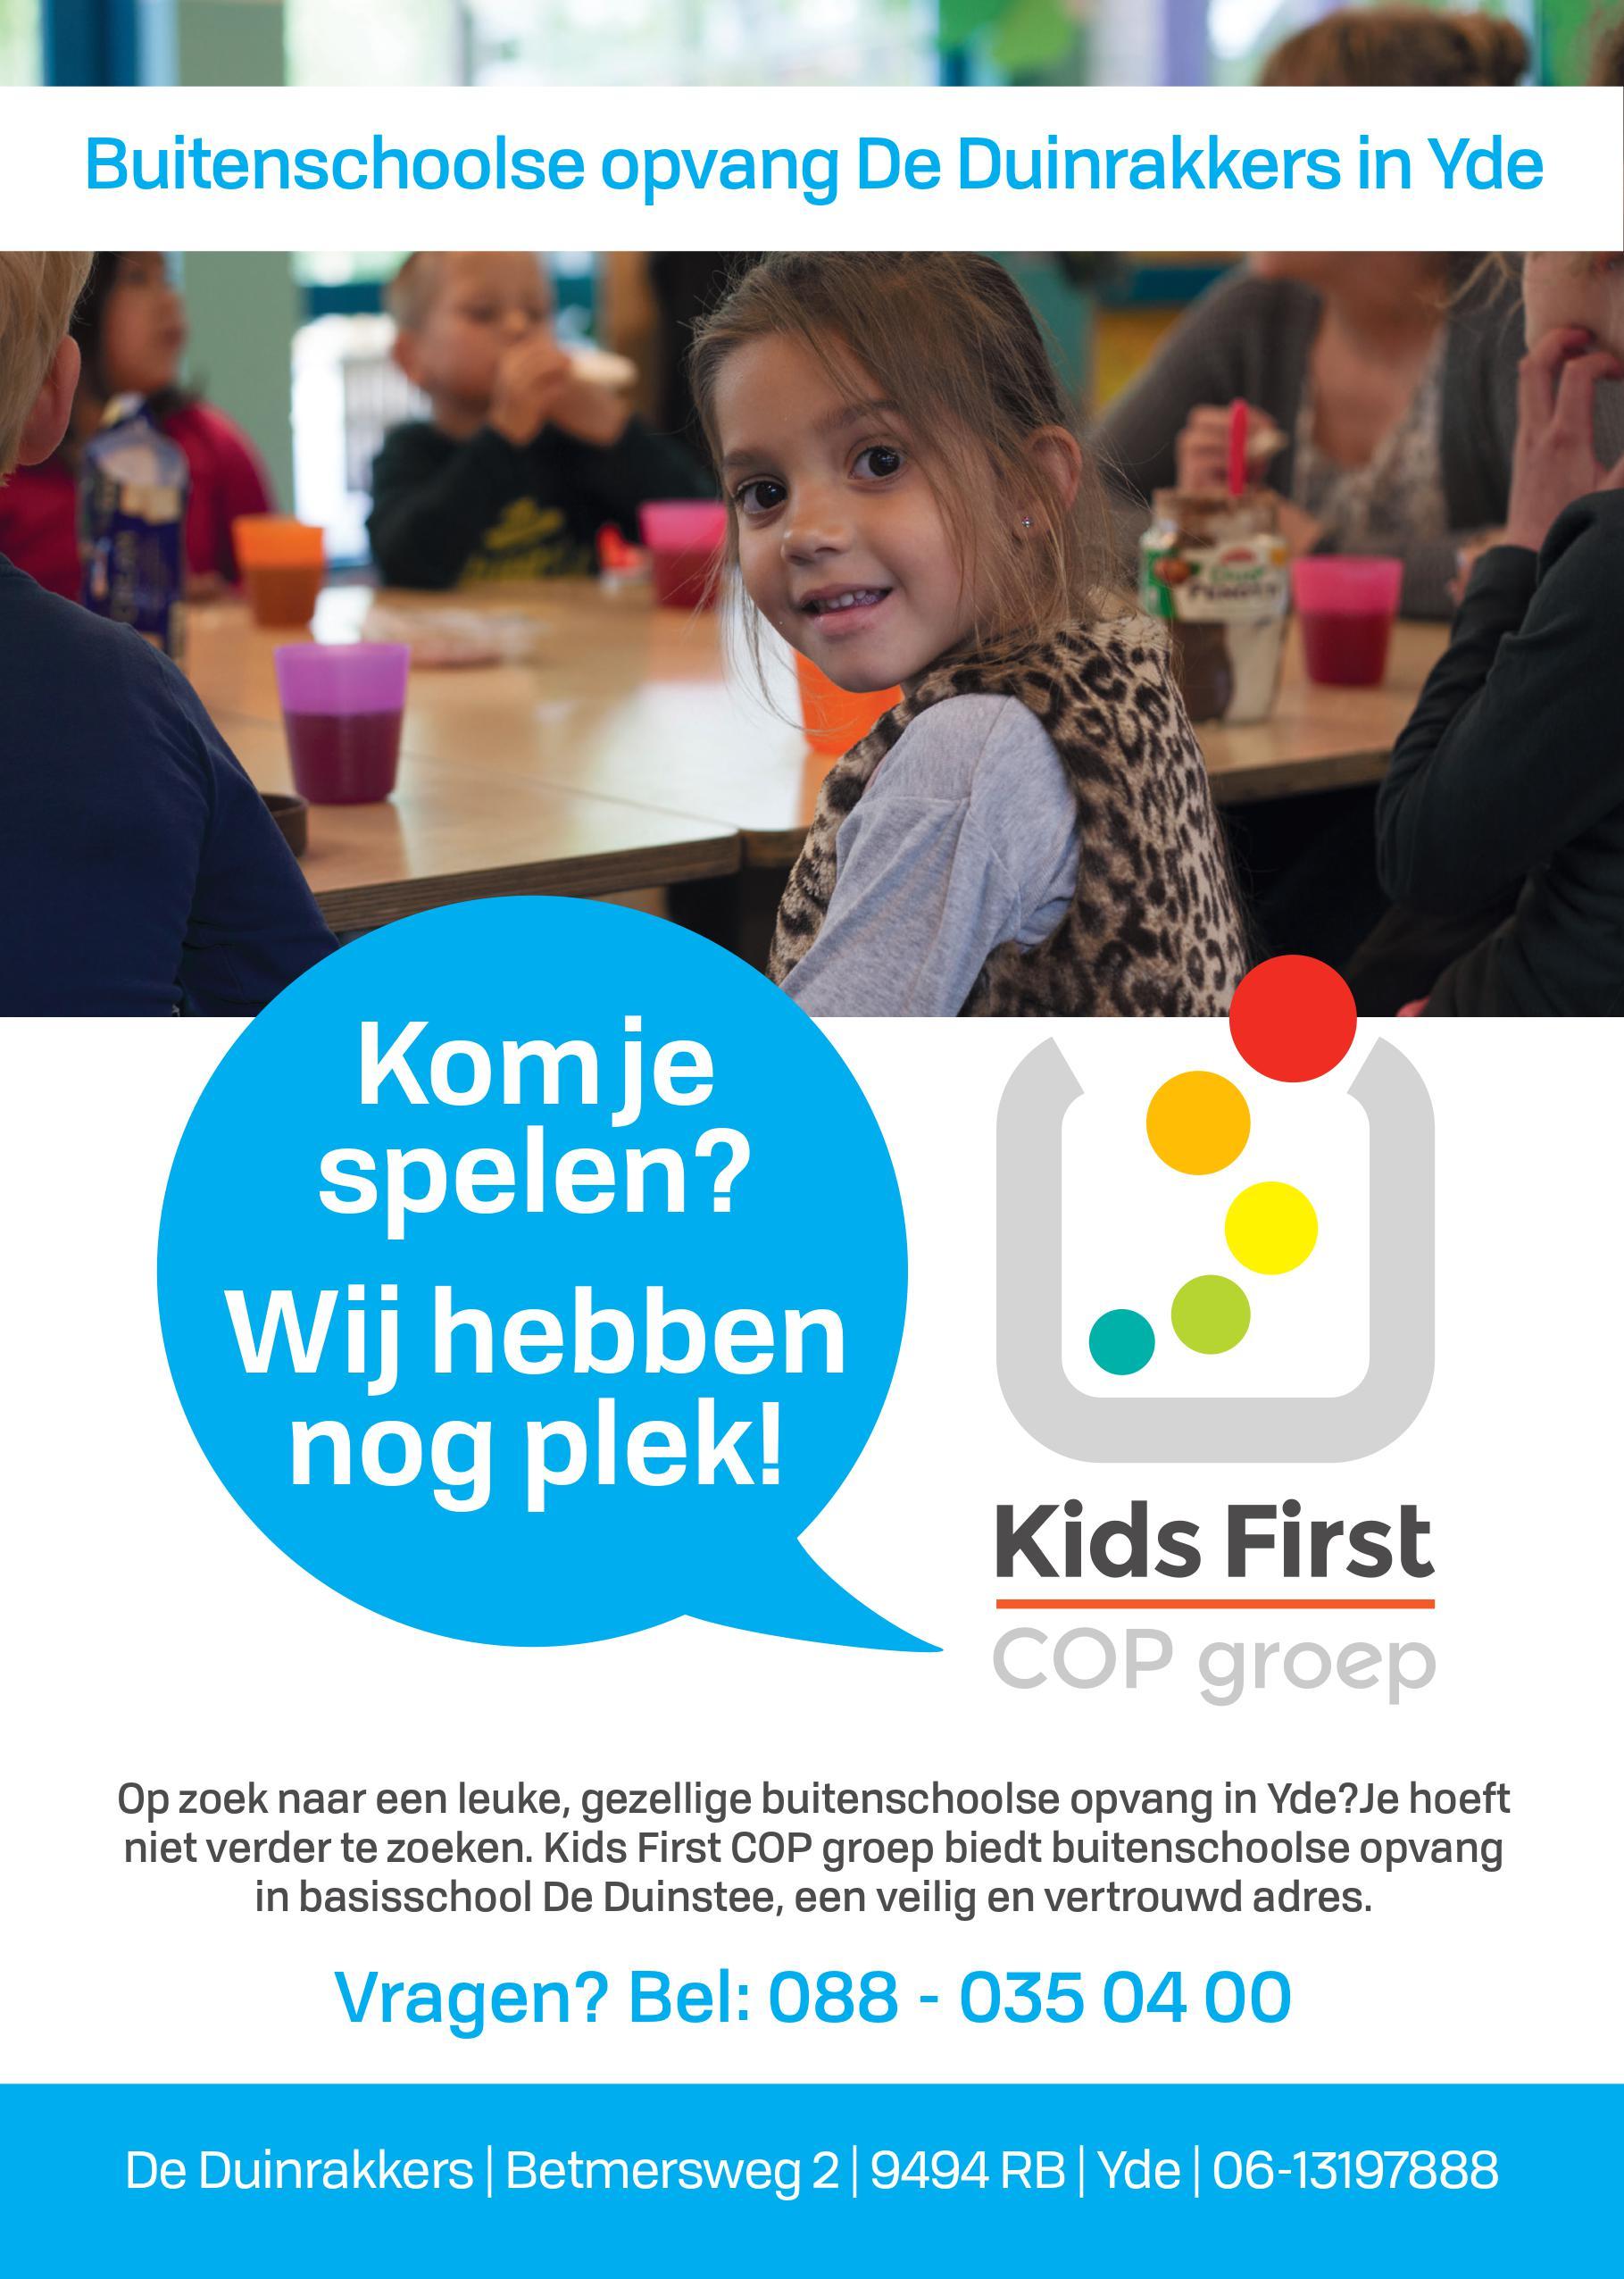 Buitenschoolse opvang De Duinrakkers Yde - Kids First COP groep